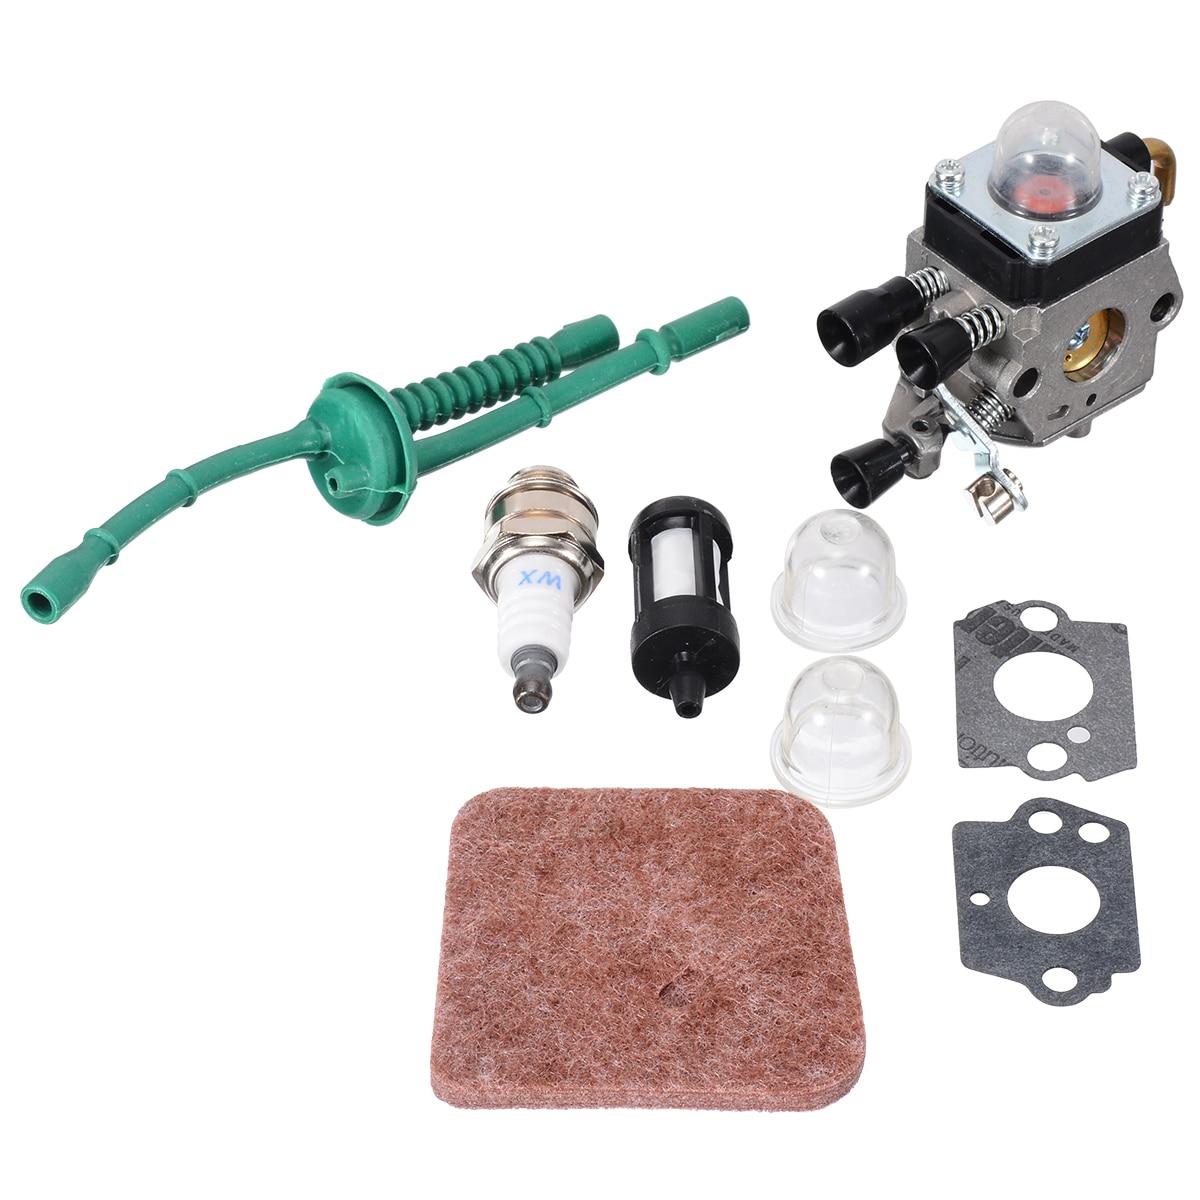 1set Carburetor Kit For FS38 FS45 FS46 FS55 KM55 FS85 Air Fuel Filter Gasket Carb Power Tool Accessory